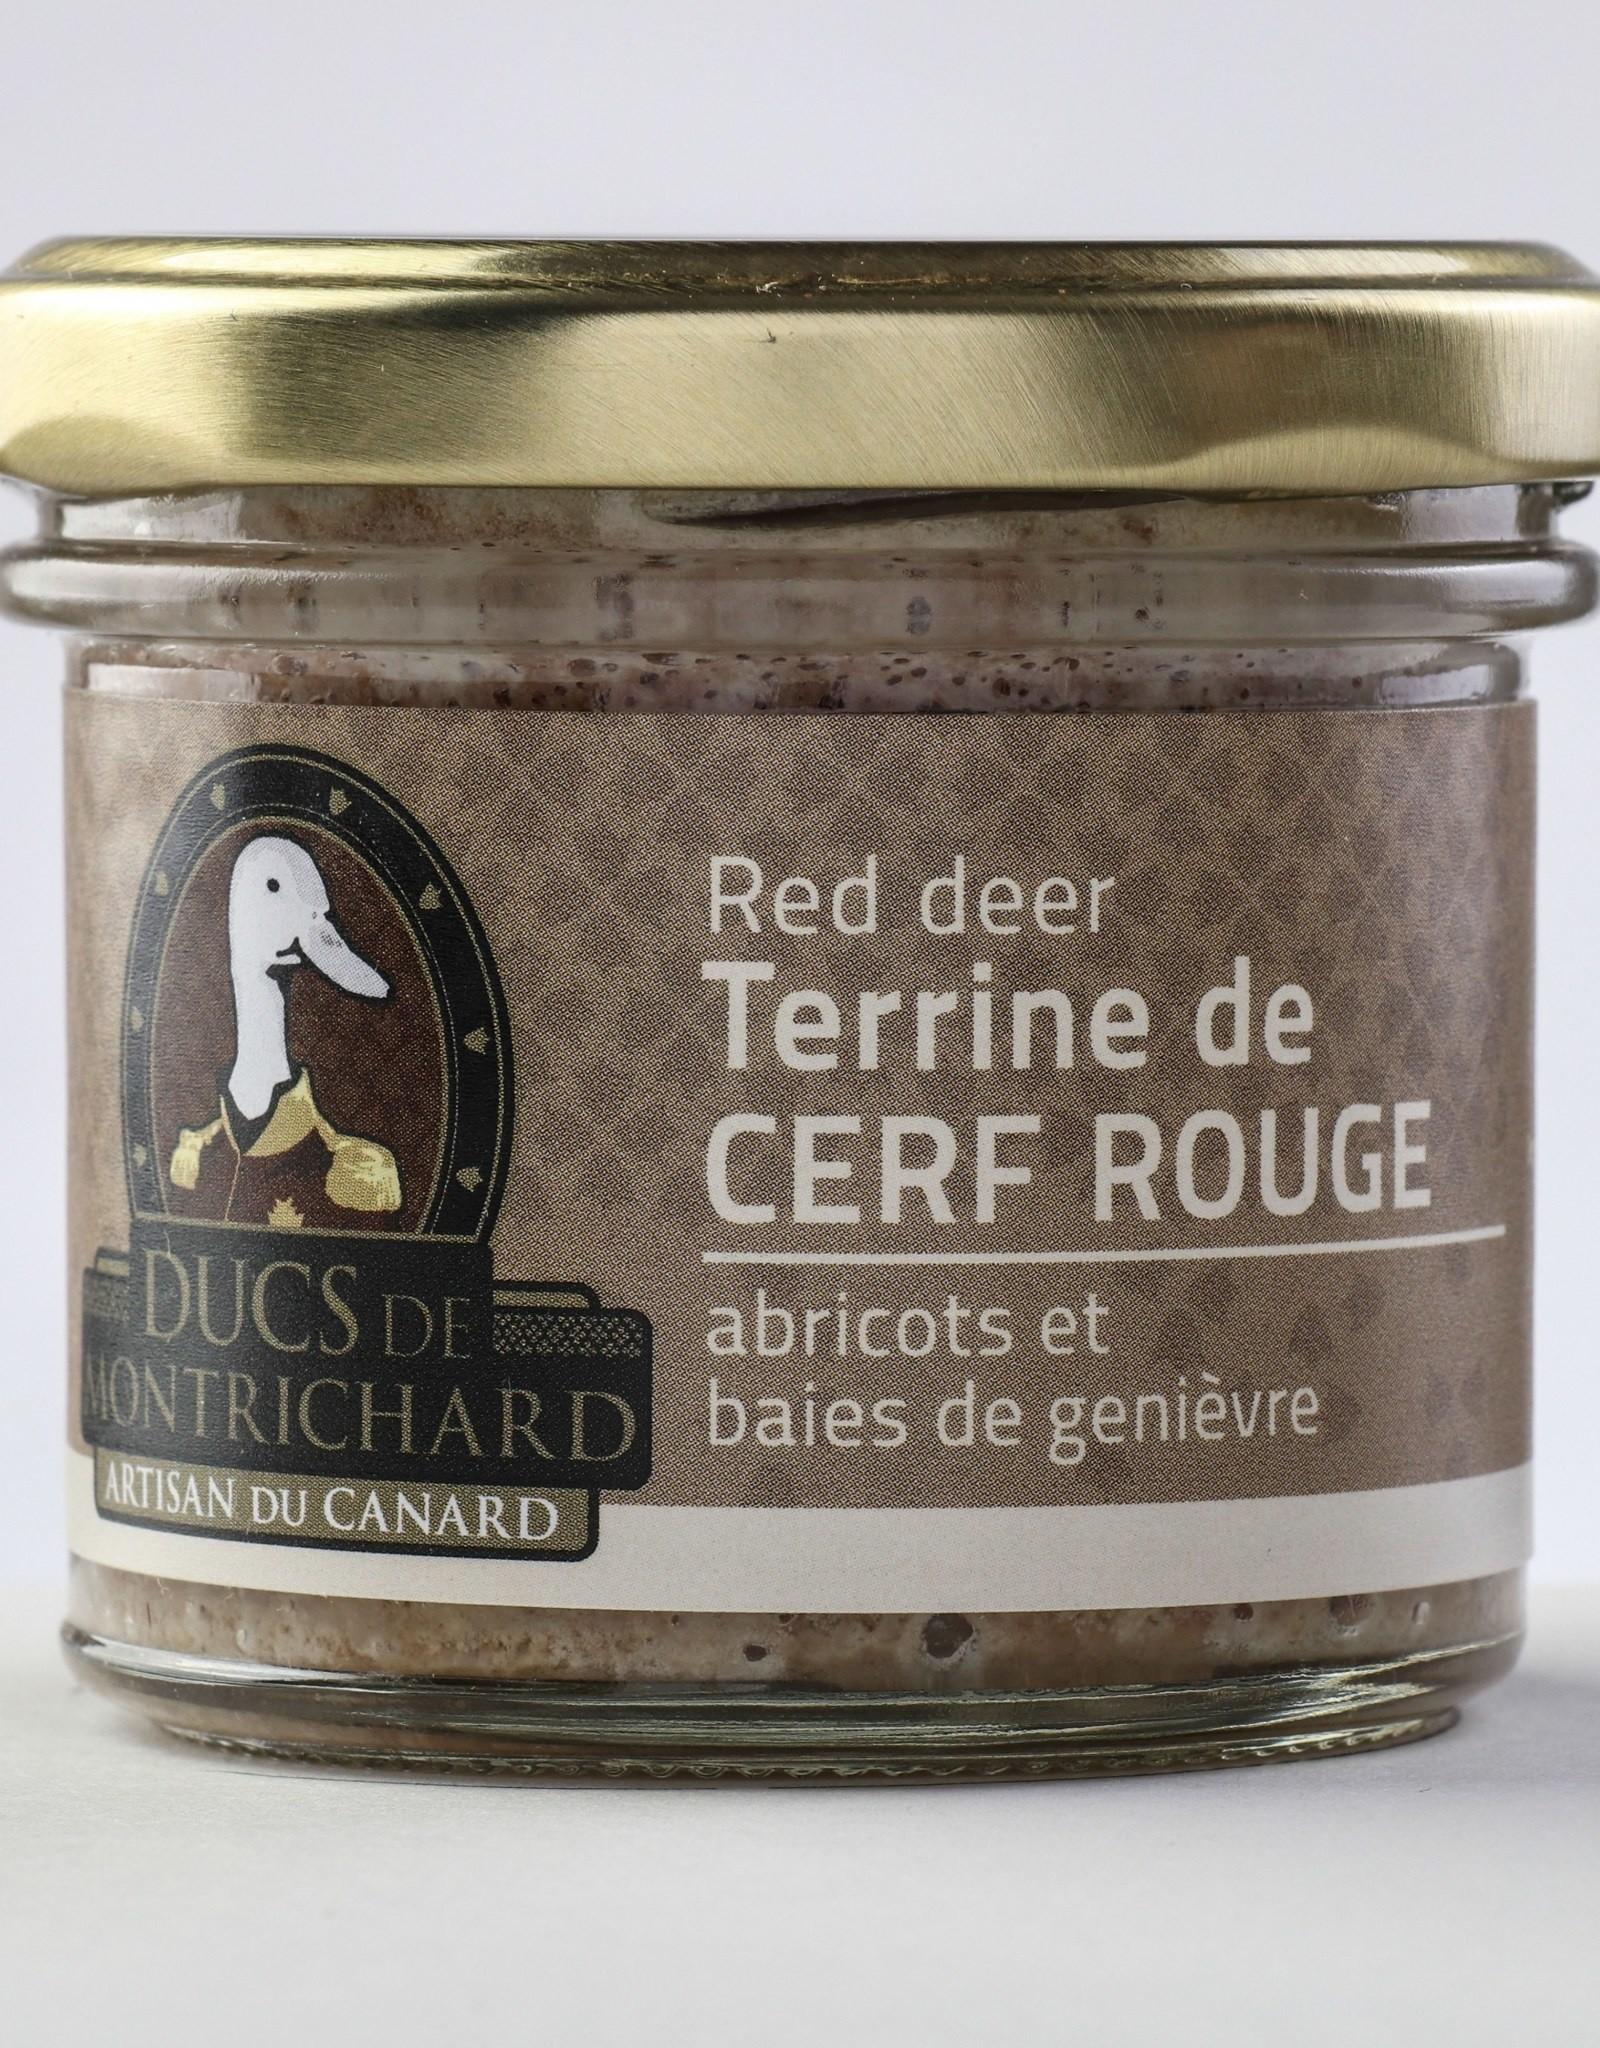 Terrine de cerf - Abricots & Baies de genièvre